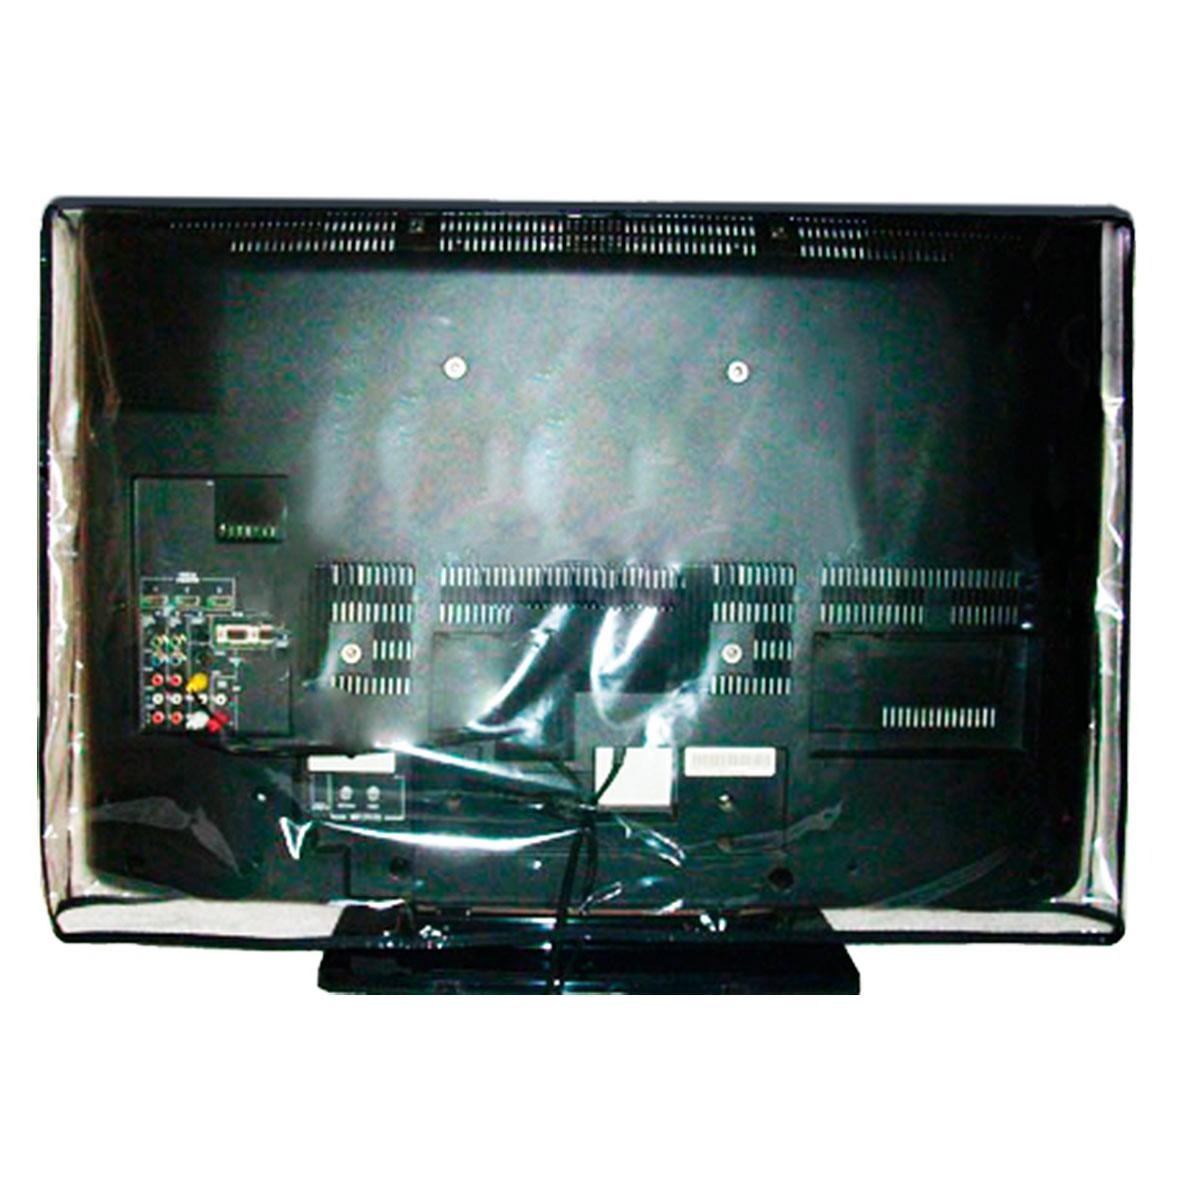 Capa Para Tv Lcd 52 Pvc Cristal - Fechada Atrás